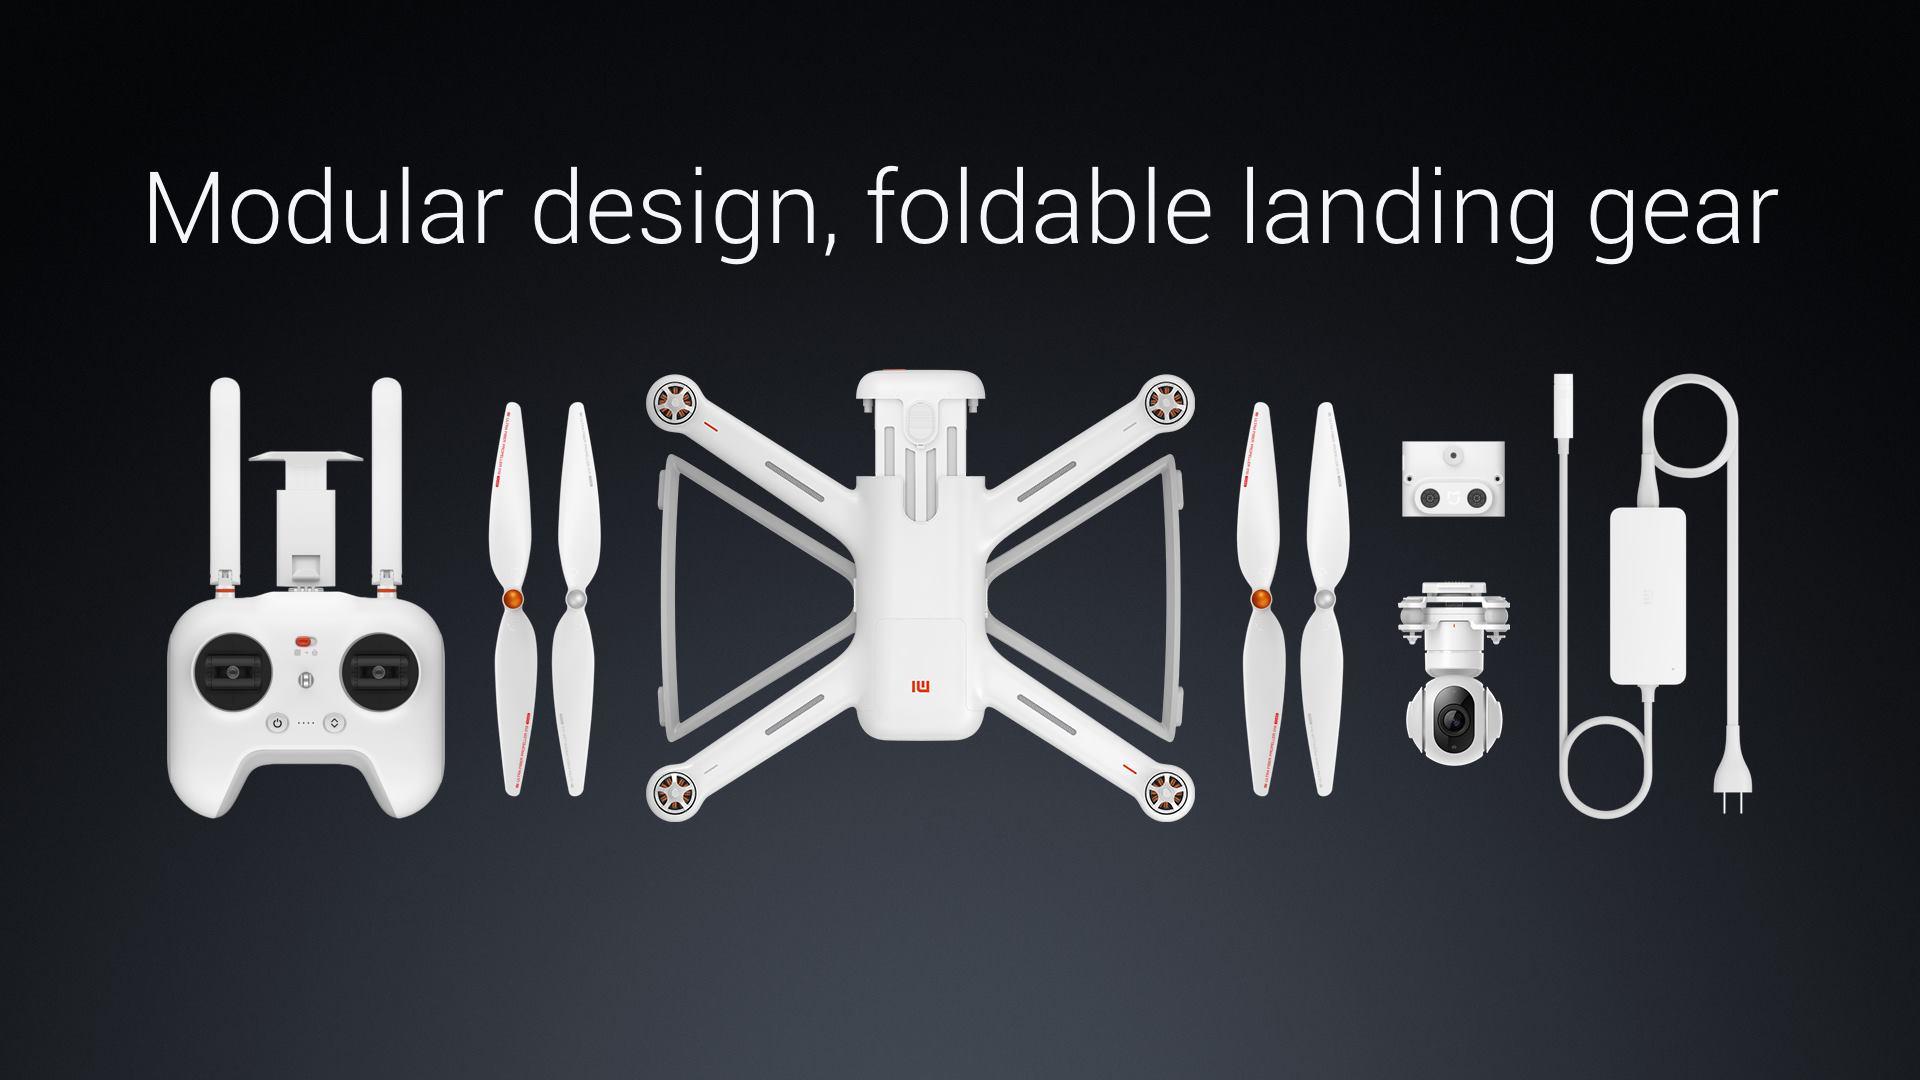 xiaomi mi drone 2 metropolitanmonkey.com